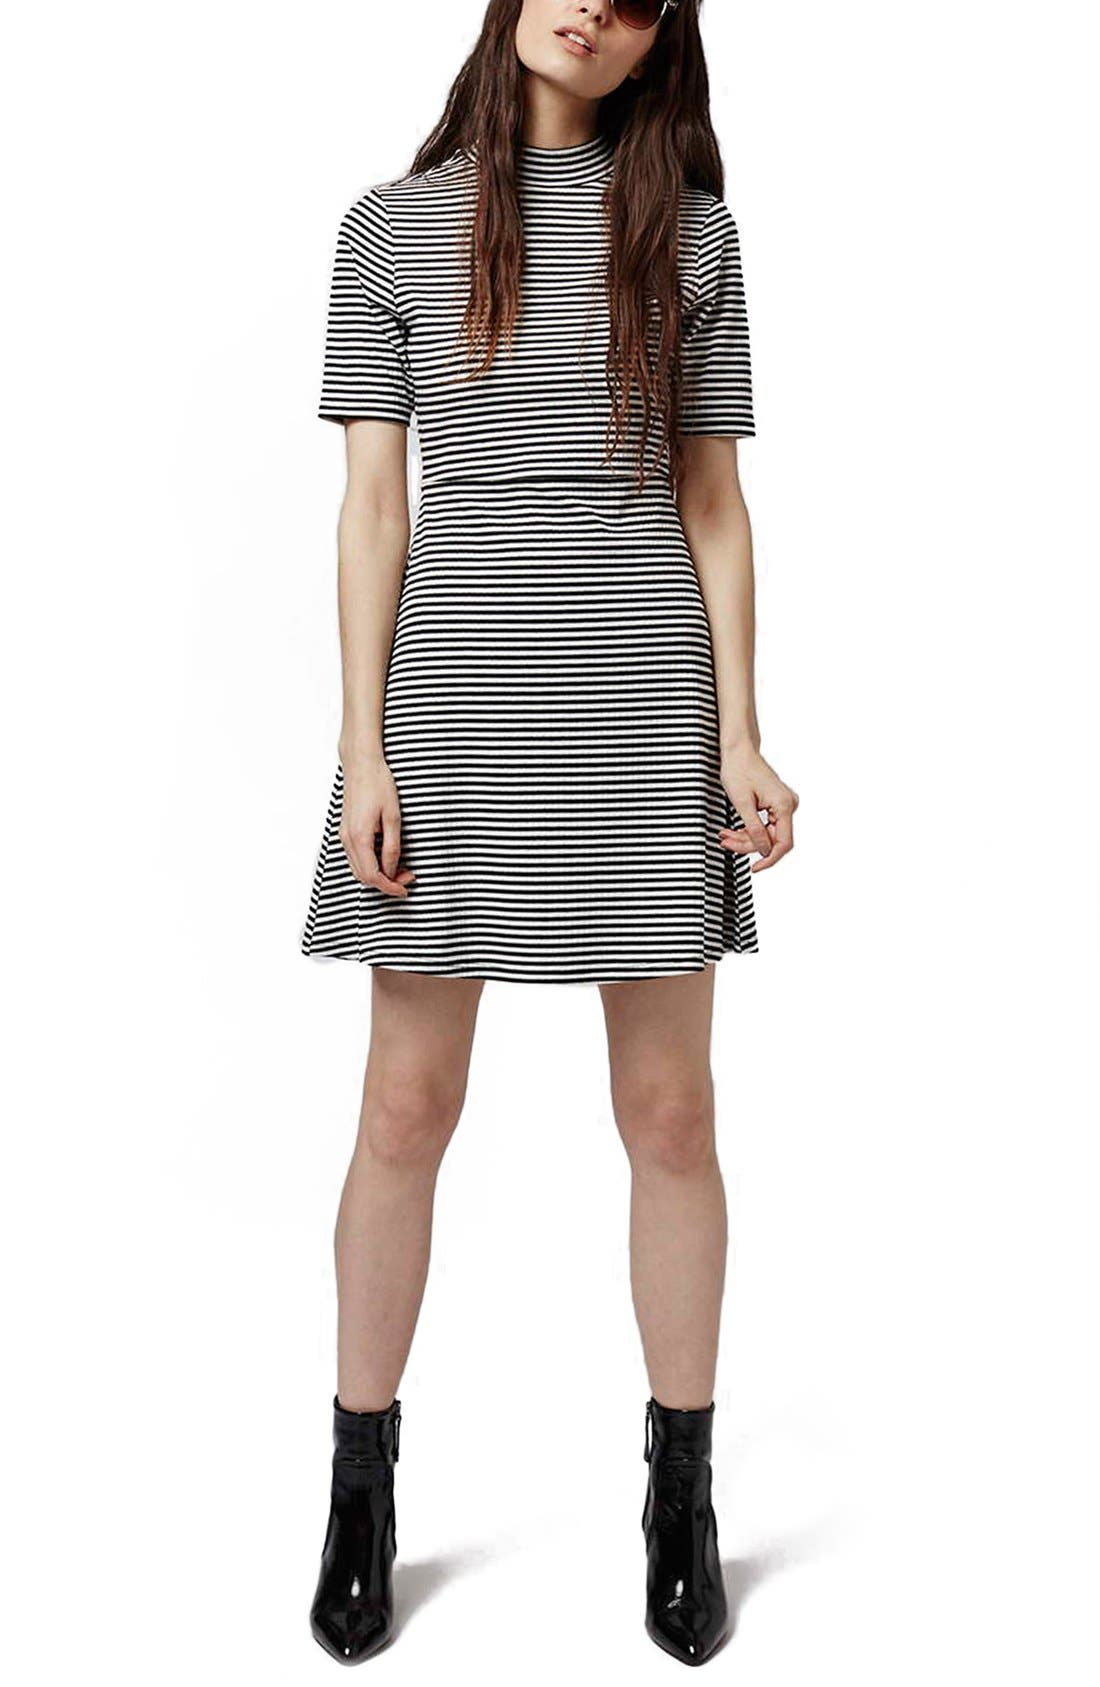 Alternate Image 1 Selected - Topshop Stripe Flippy Dress (Petite)